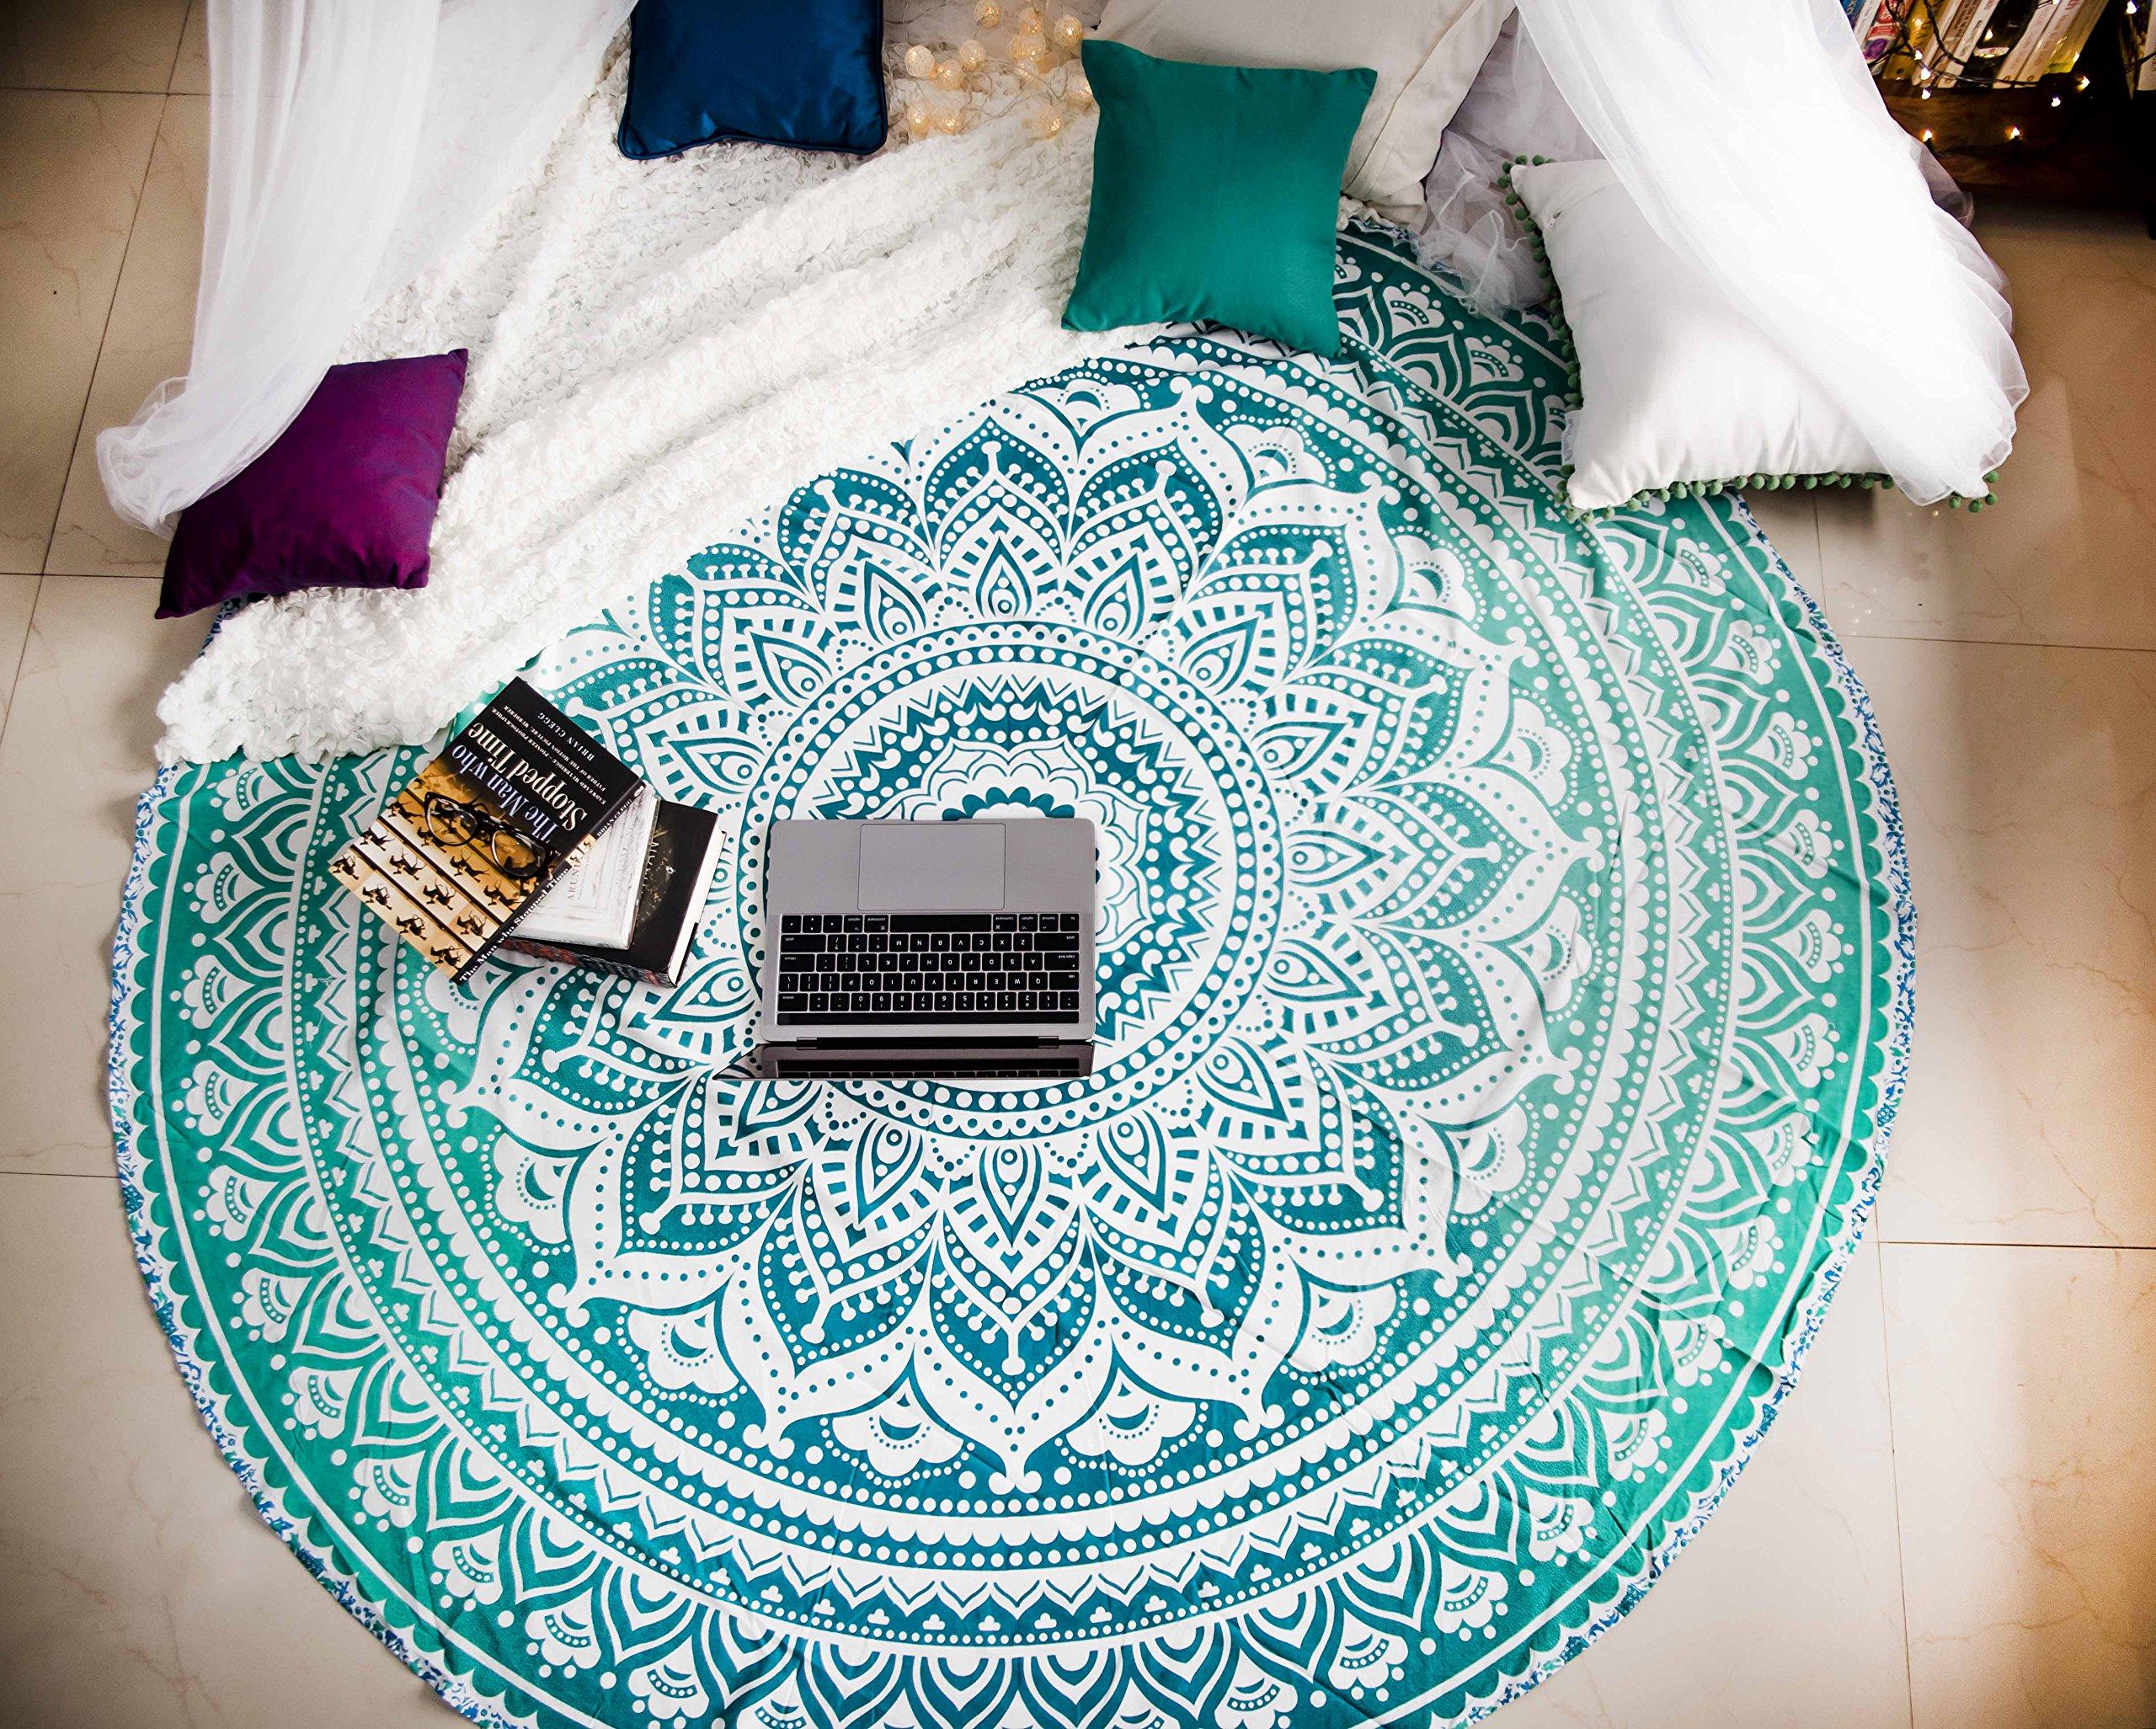 Tealtastic Mandala Round Tapestry Hippie Indian Mandala Beach Roundie Picnic Table Throw Hippy Bohemian Spread Boho Gypsy Cotton Tablecloth Beach Towel Meditation Round Yoga Mat - 72 Inches, Green